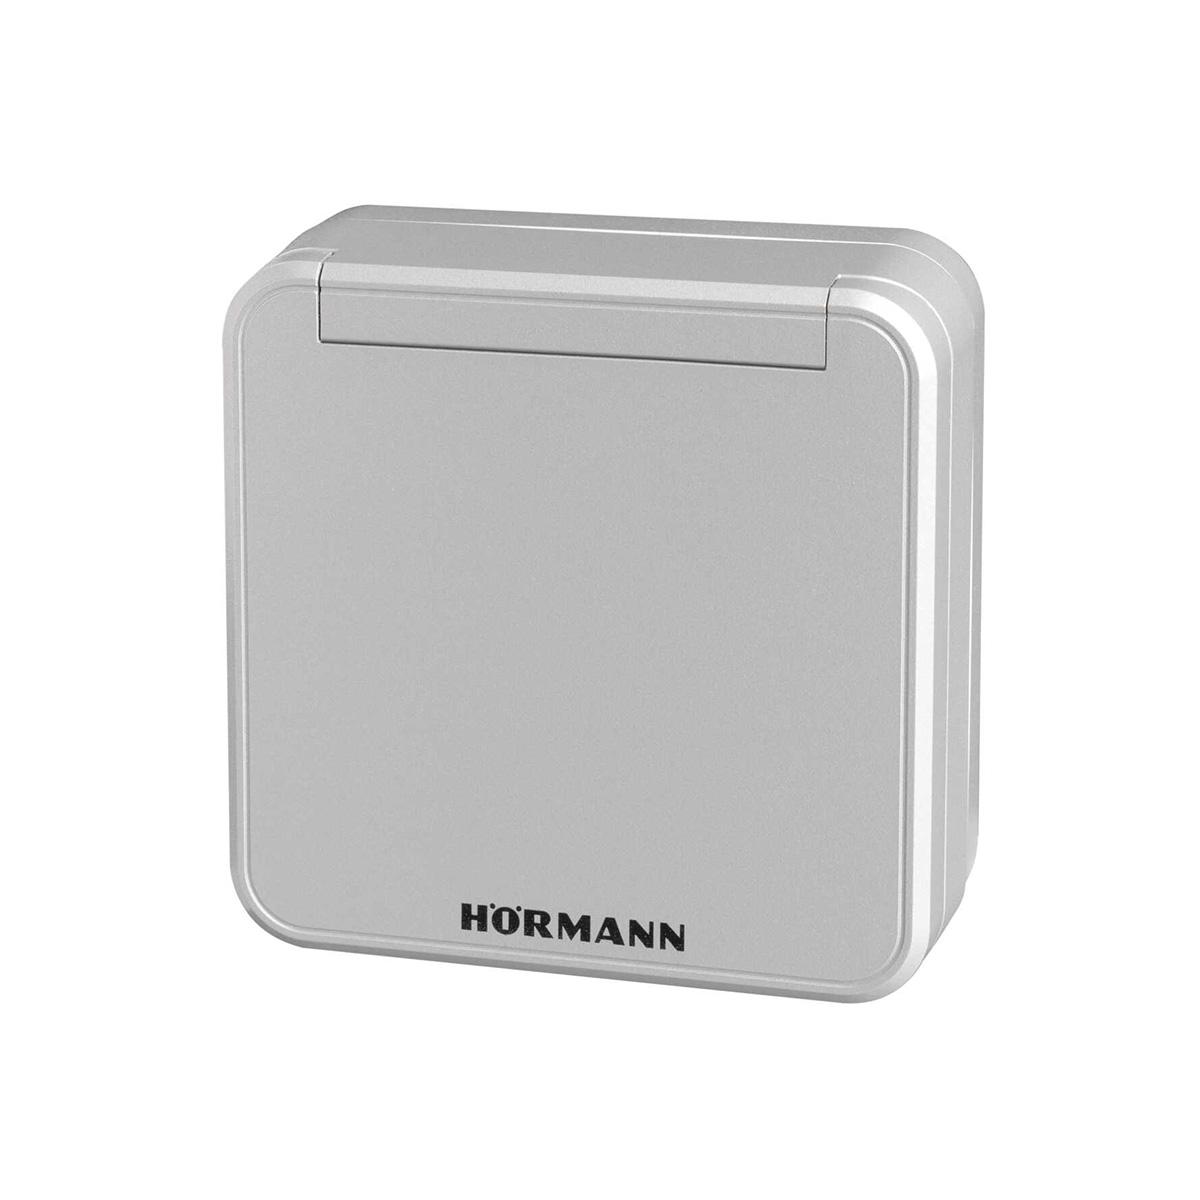 Hörmann Funk-Fingerleser FFL 25 BS